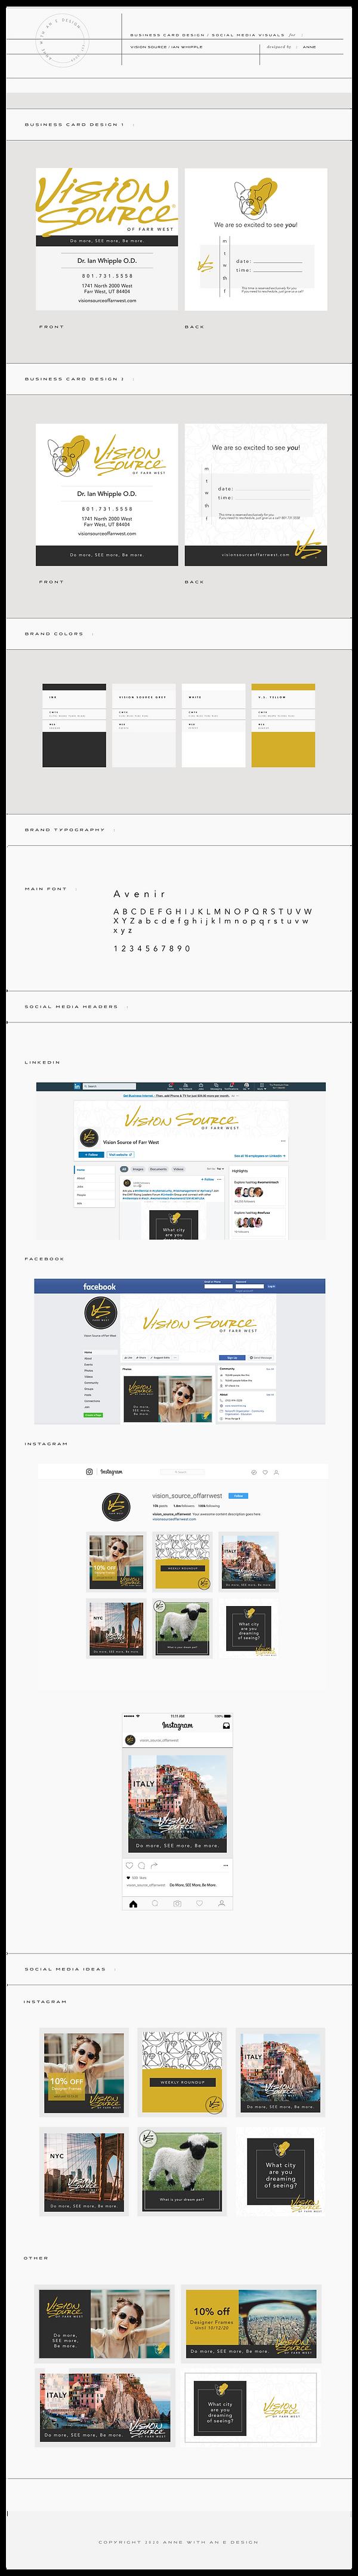 visionsourceoffarrwestbrandboard.png